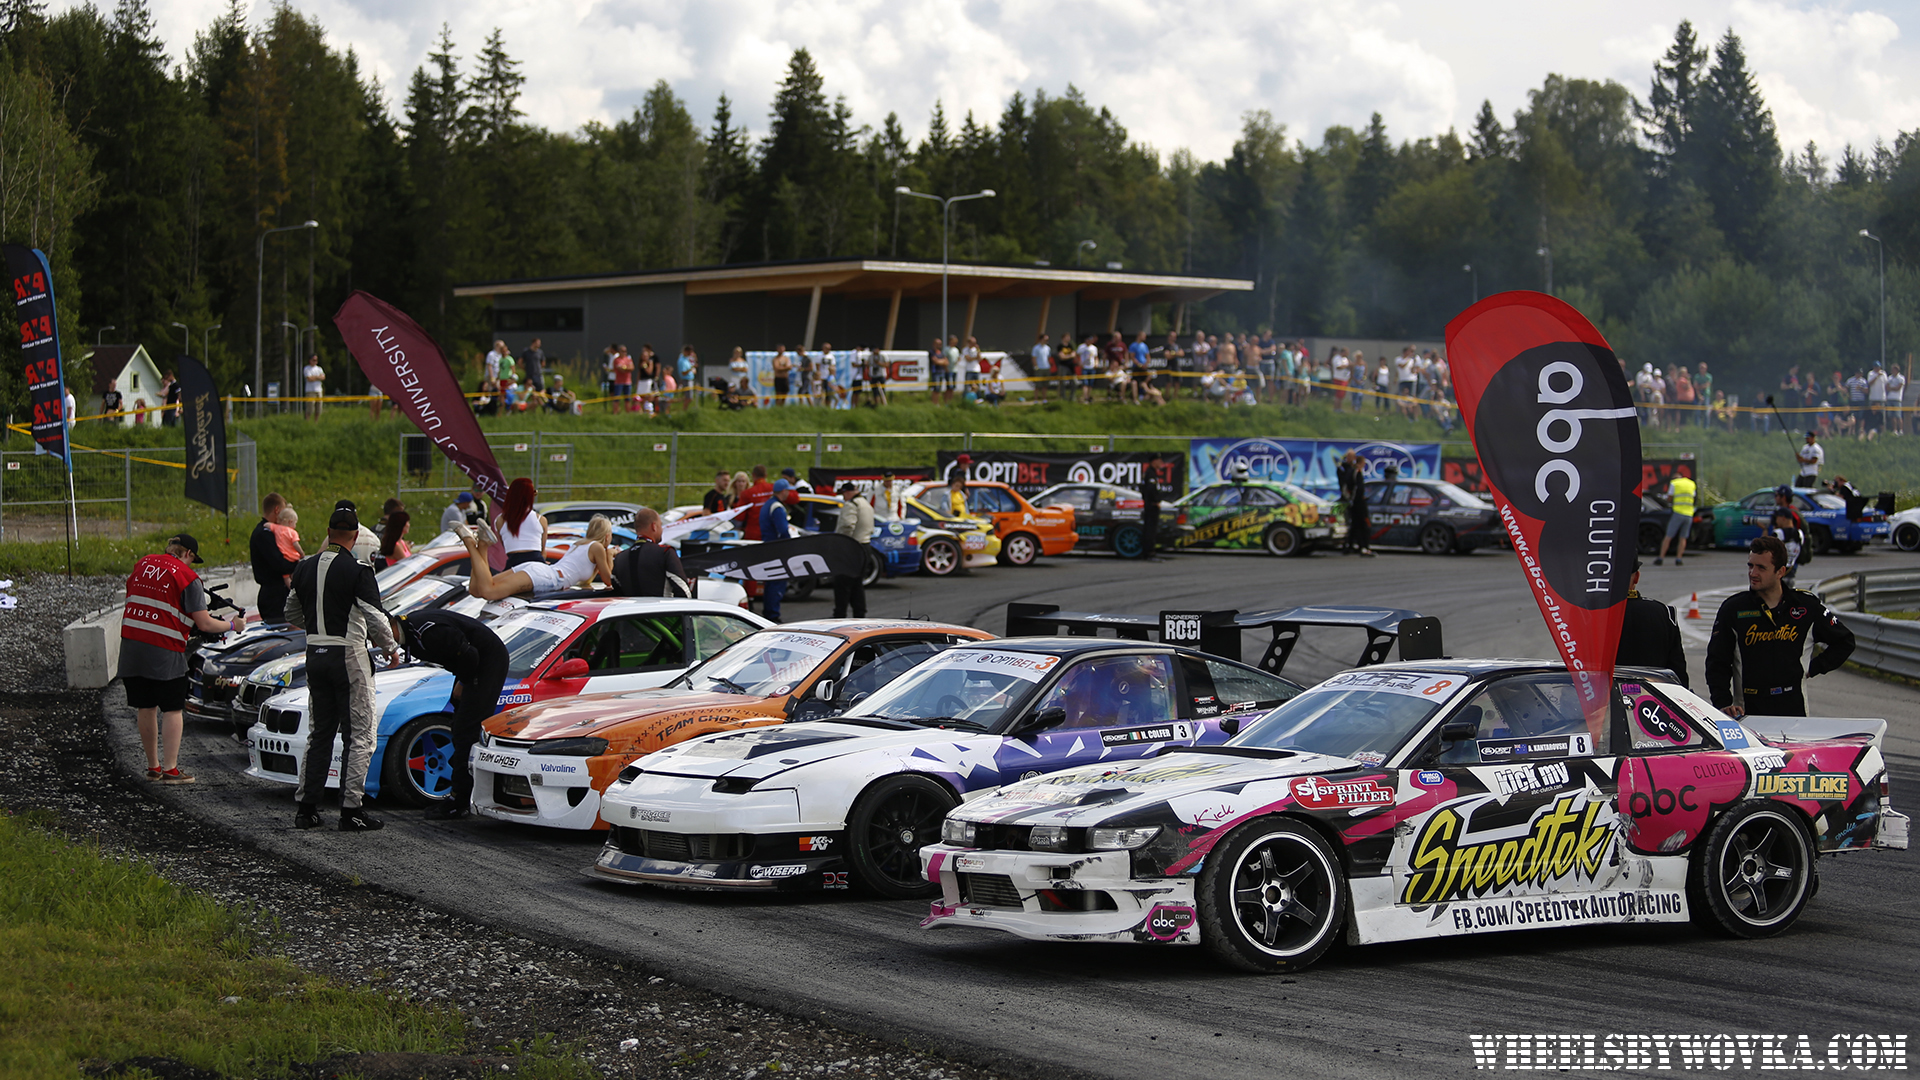 10-years-of-drifting-in-estonia-2016-by-wheelsbywovka-2